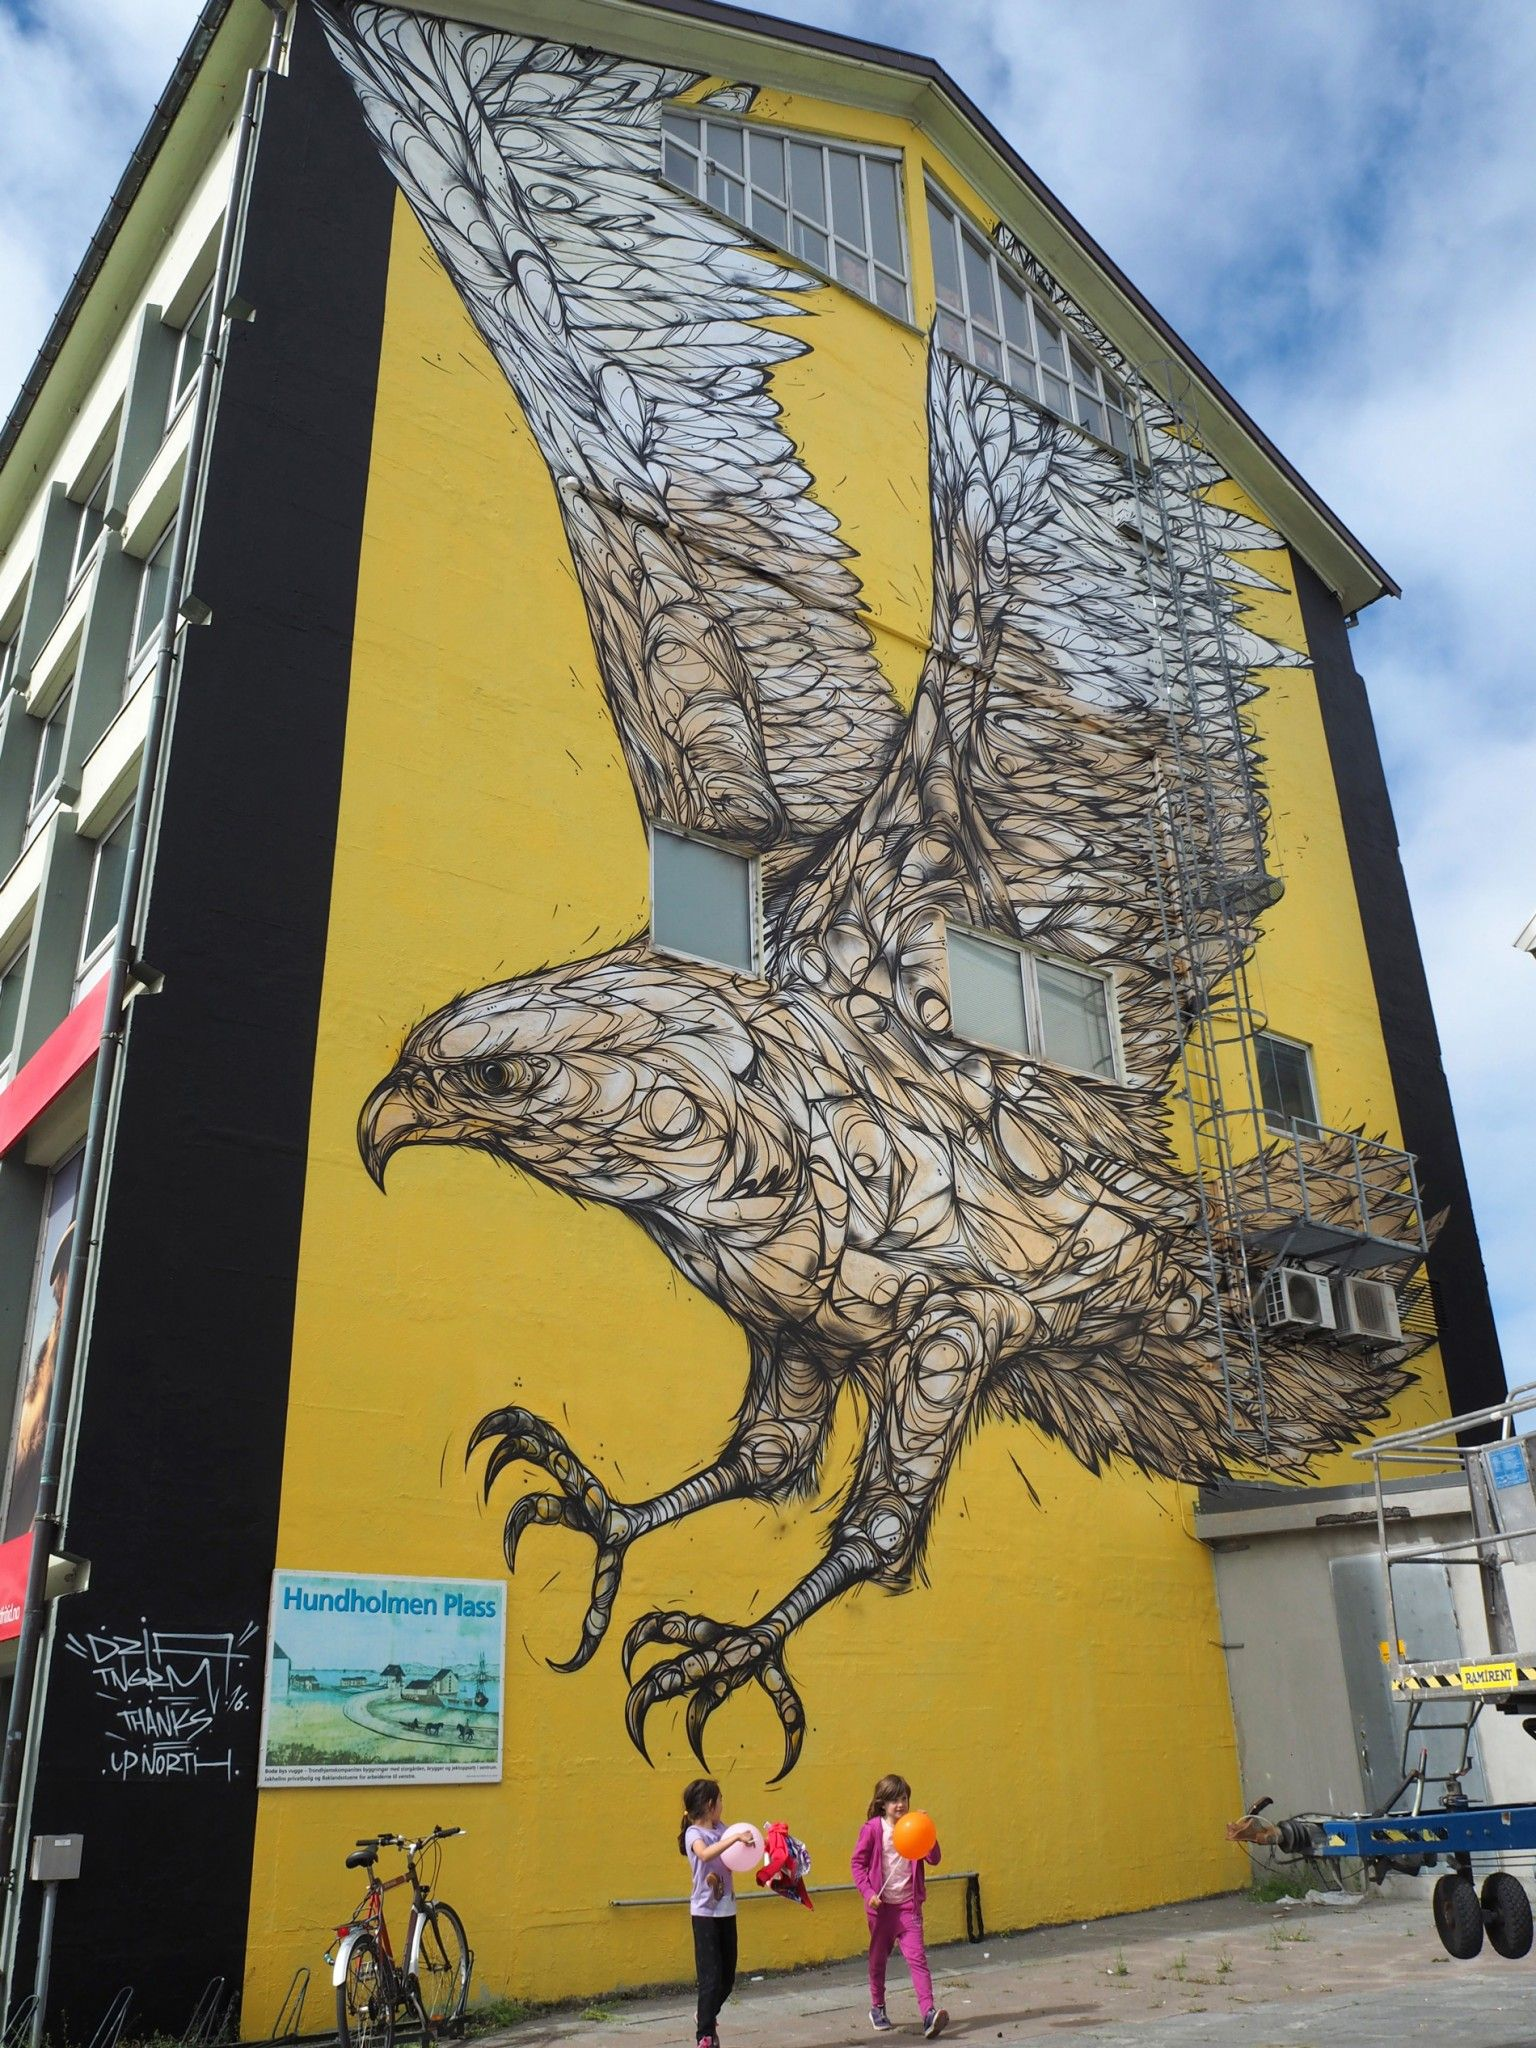 dzia eagle | grafiti | Pinterest | Eagle, Street art and Artwork